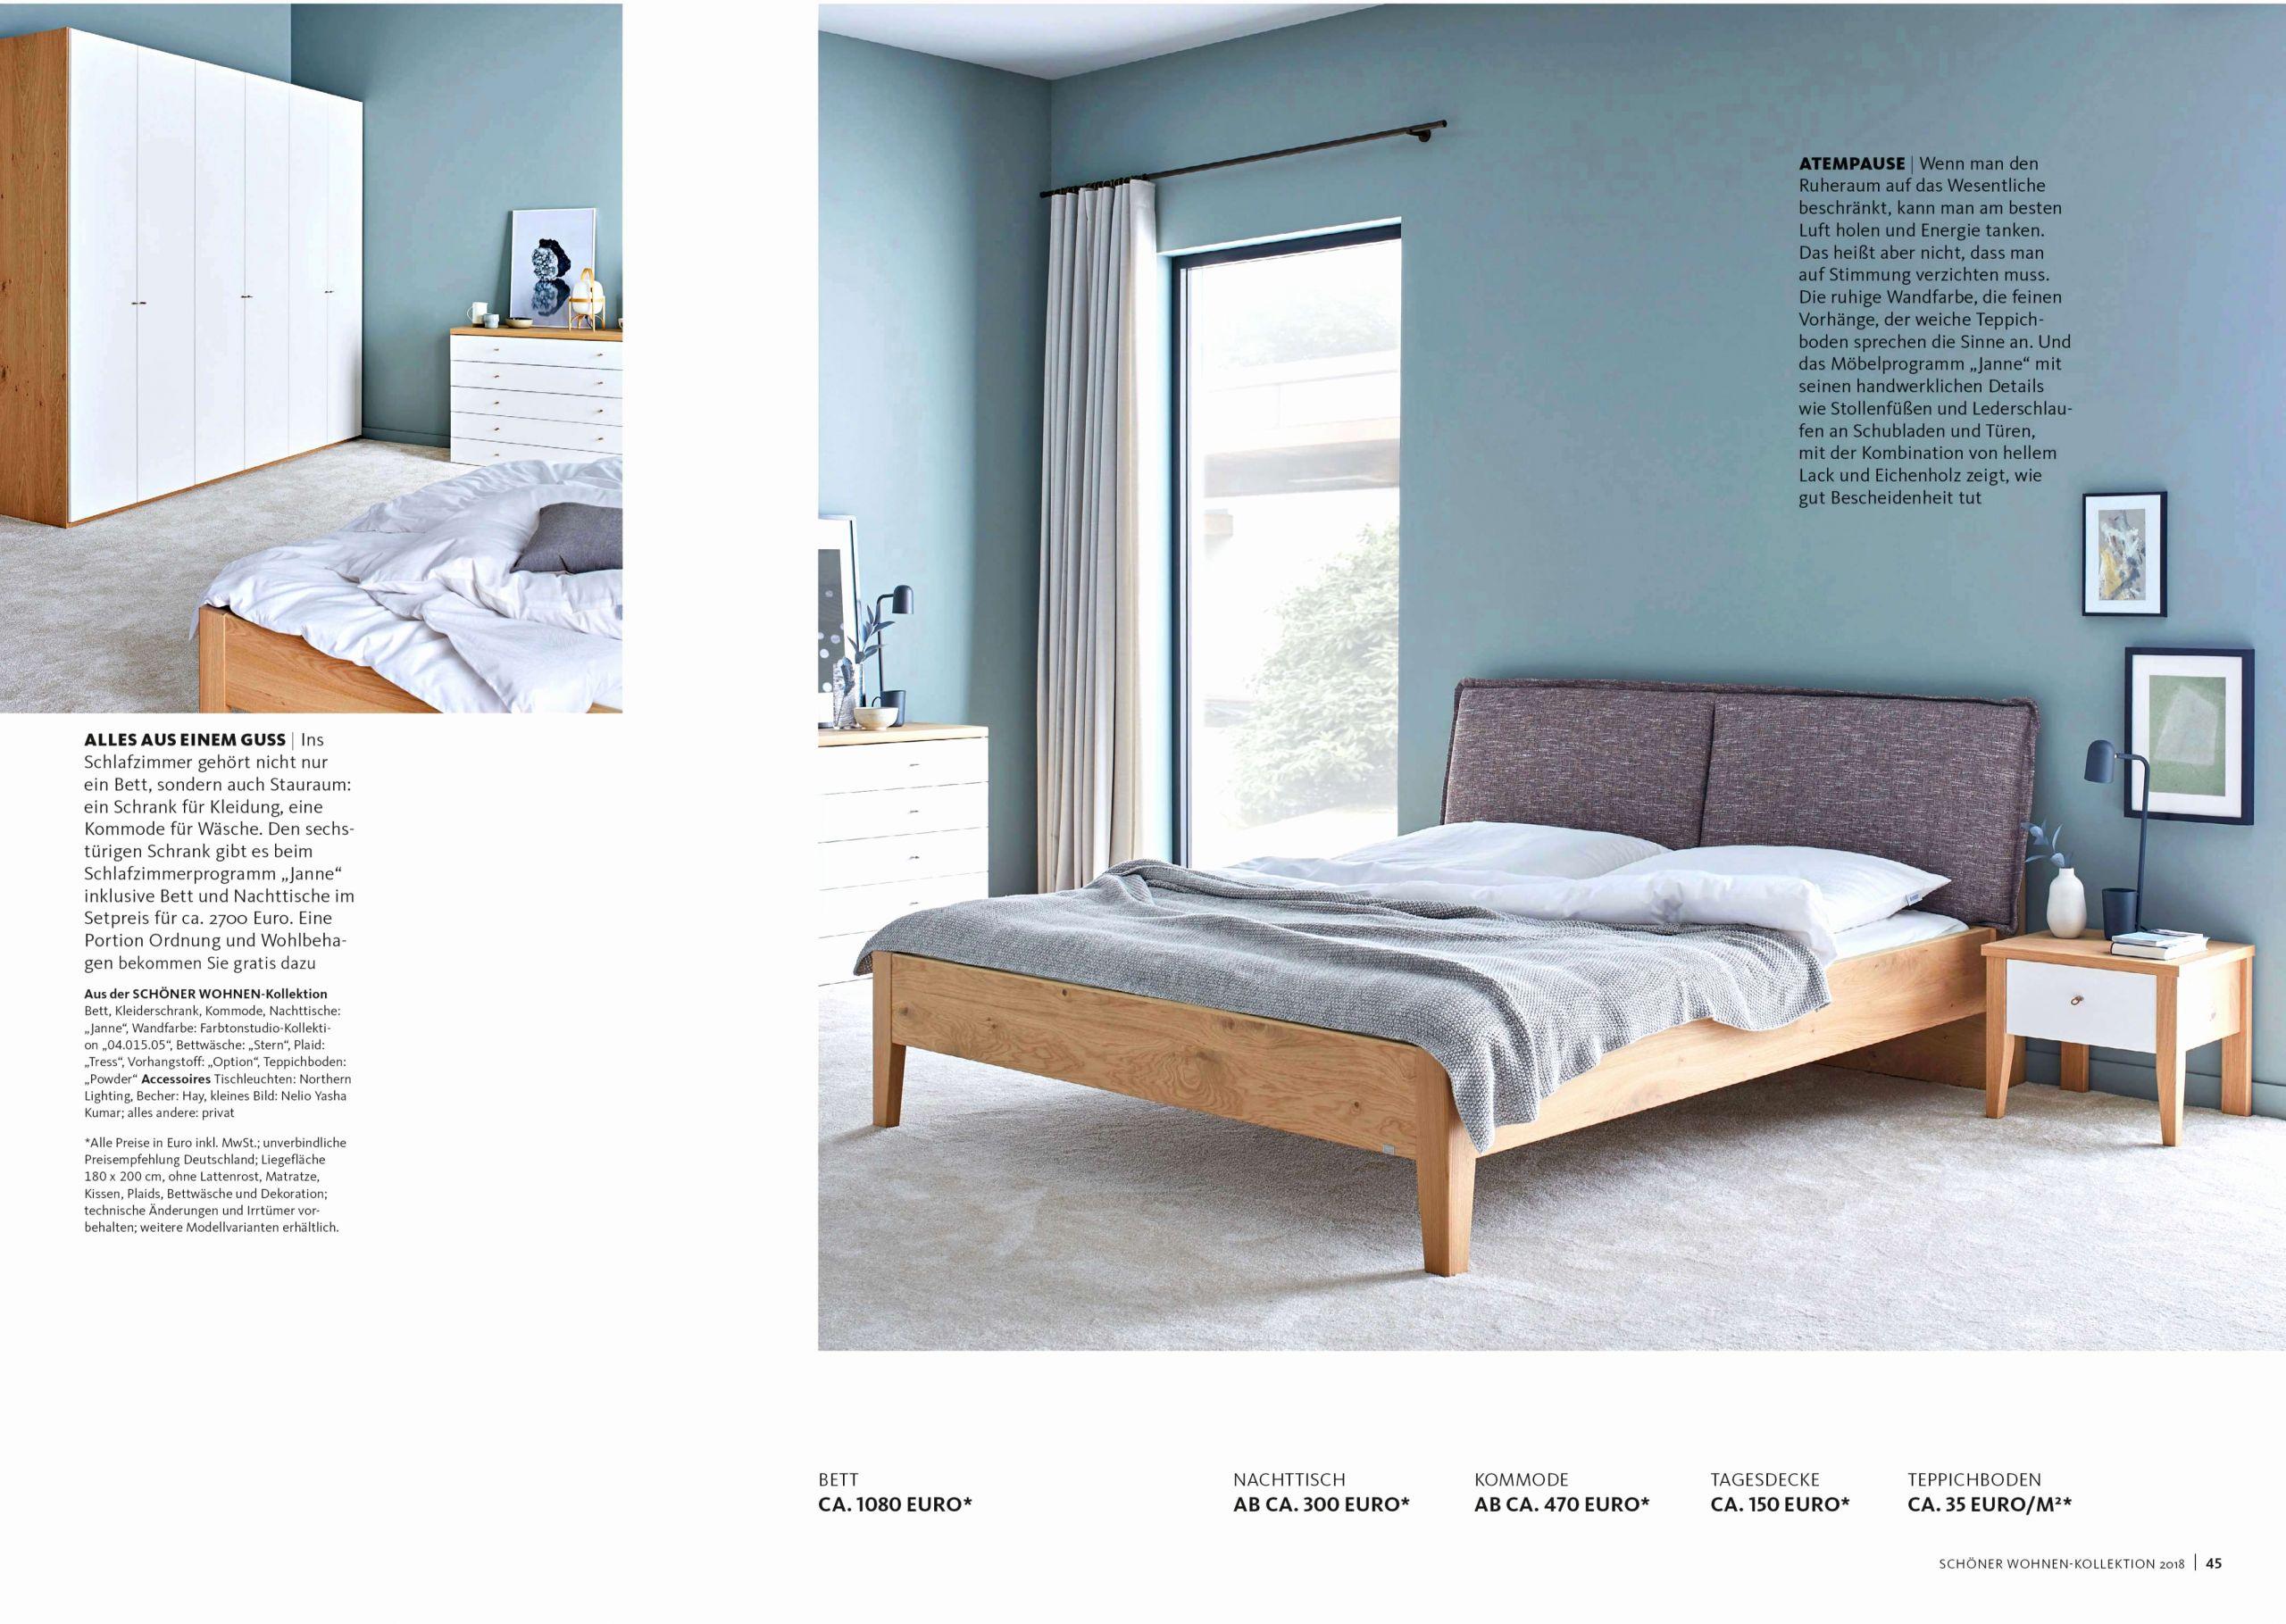 schlafzimmer holz modern frais eckbank aus holz models esszimmer sitzbank kiefer 0d beste design of schlafzimmer holz modern